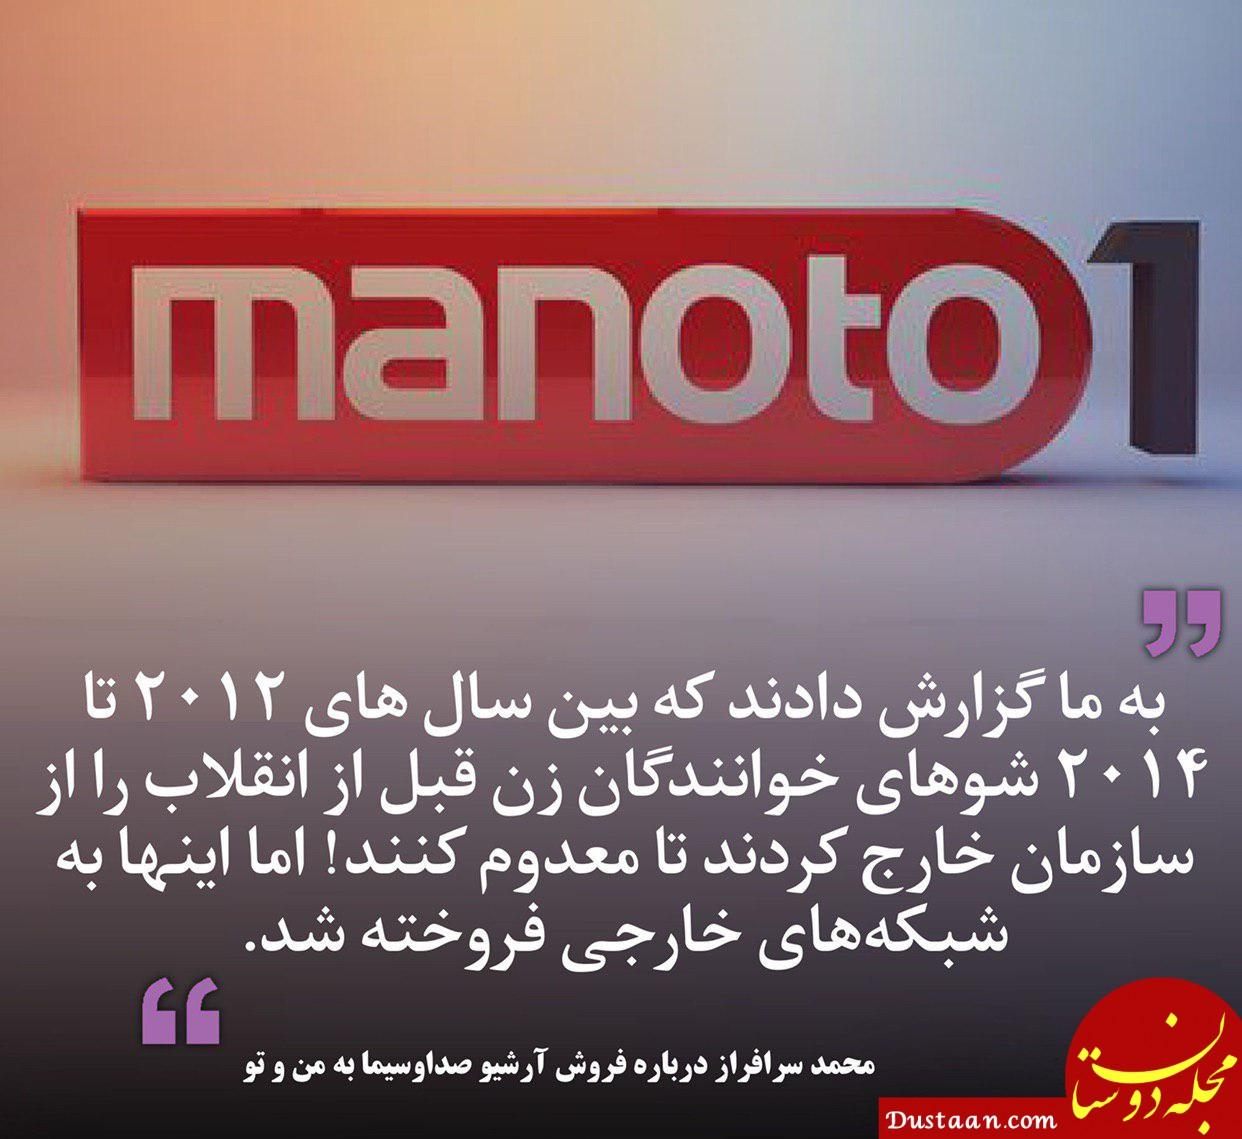 www.dustaan.com شوی خوانندگان زن قبل از انقلاب را به بهانه معدوم کردن به شبکه های خارجی فروختند!